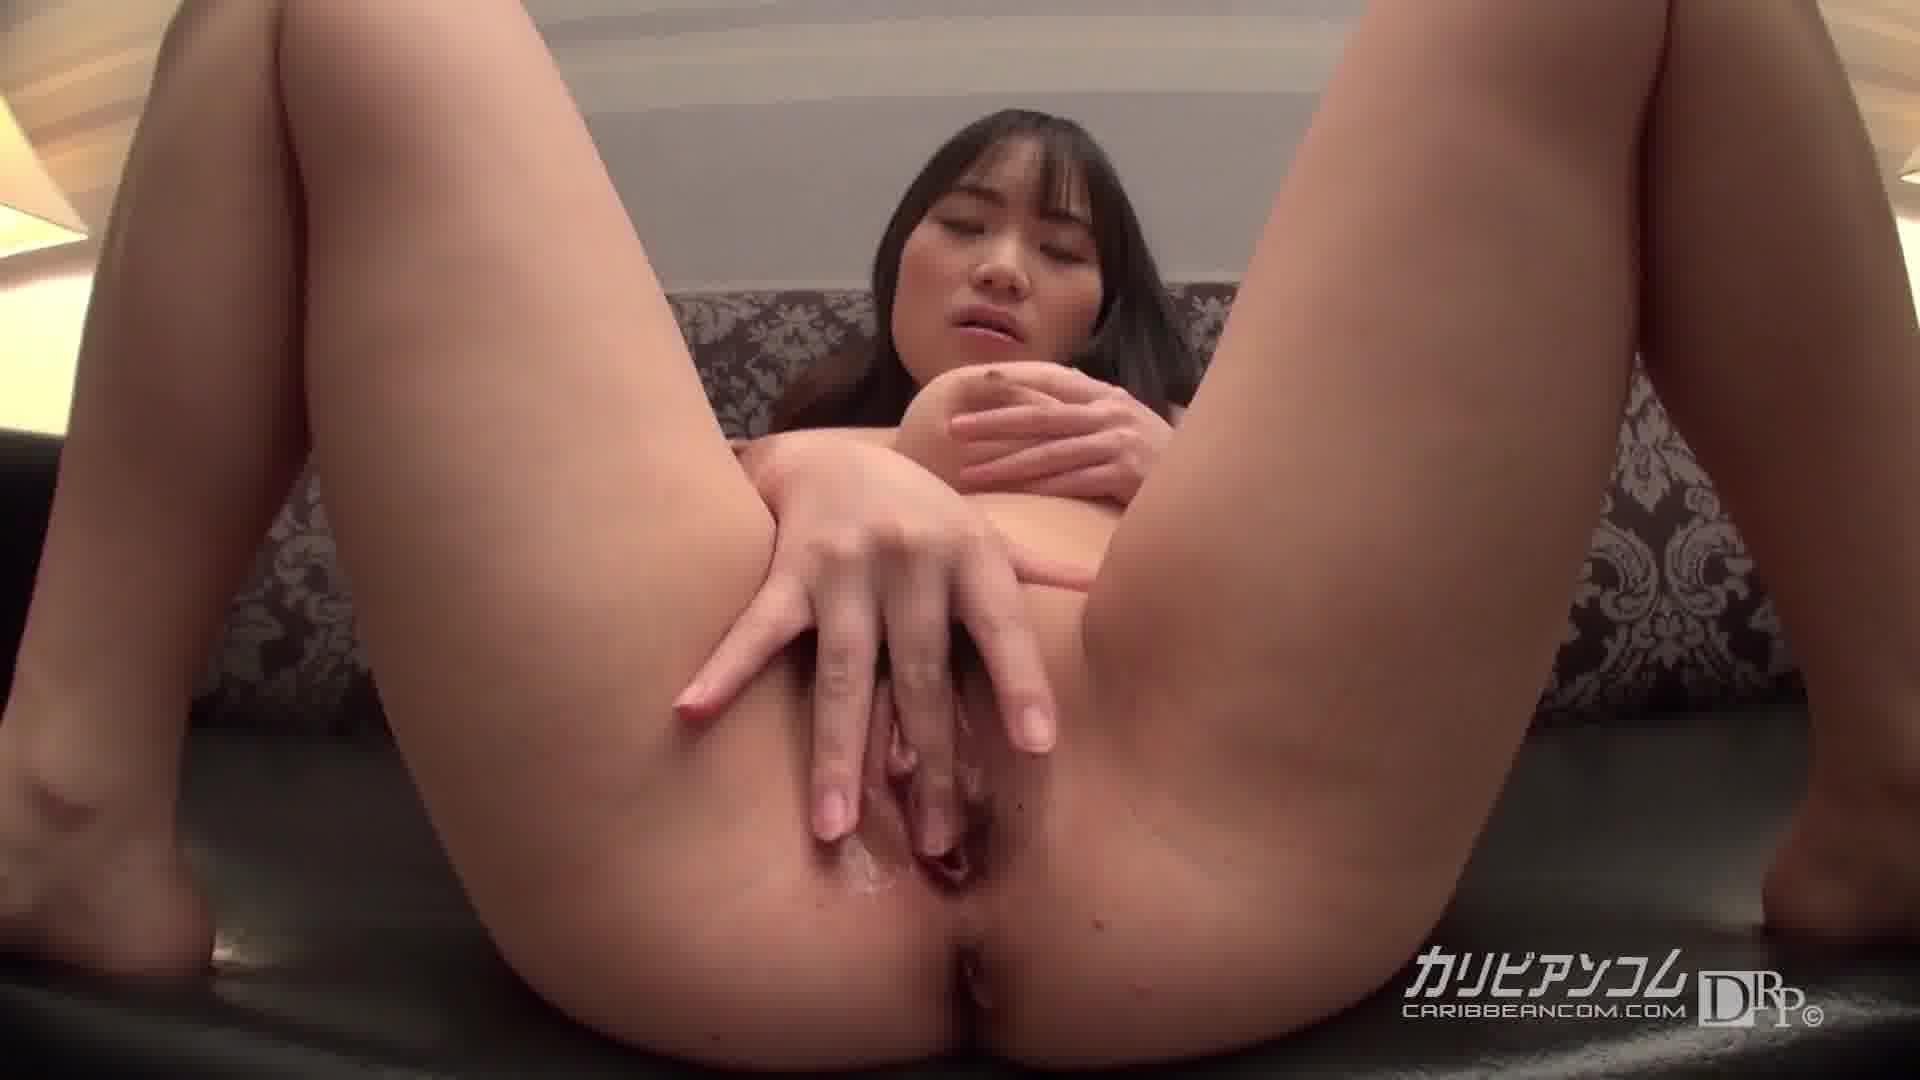 マンコ図鑑 持田美琴 - 持田美琴【痴女・美乳・巨乳】